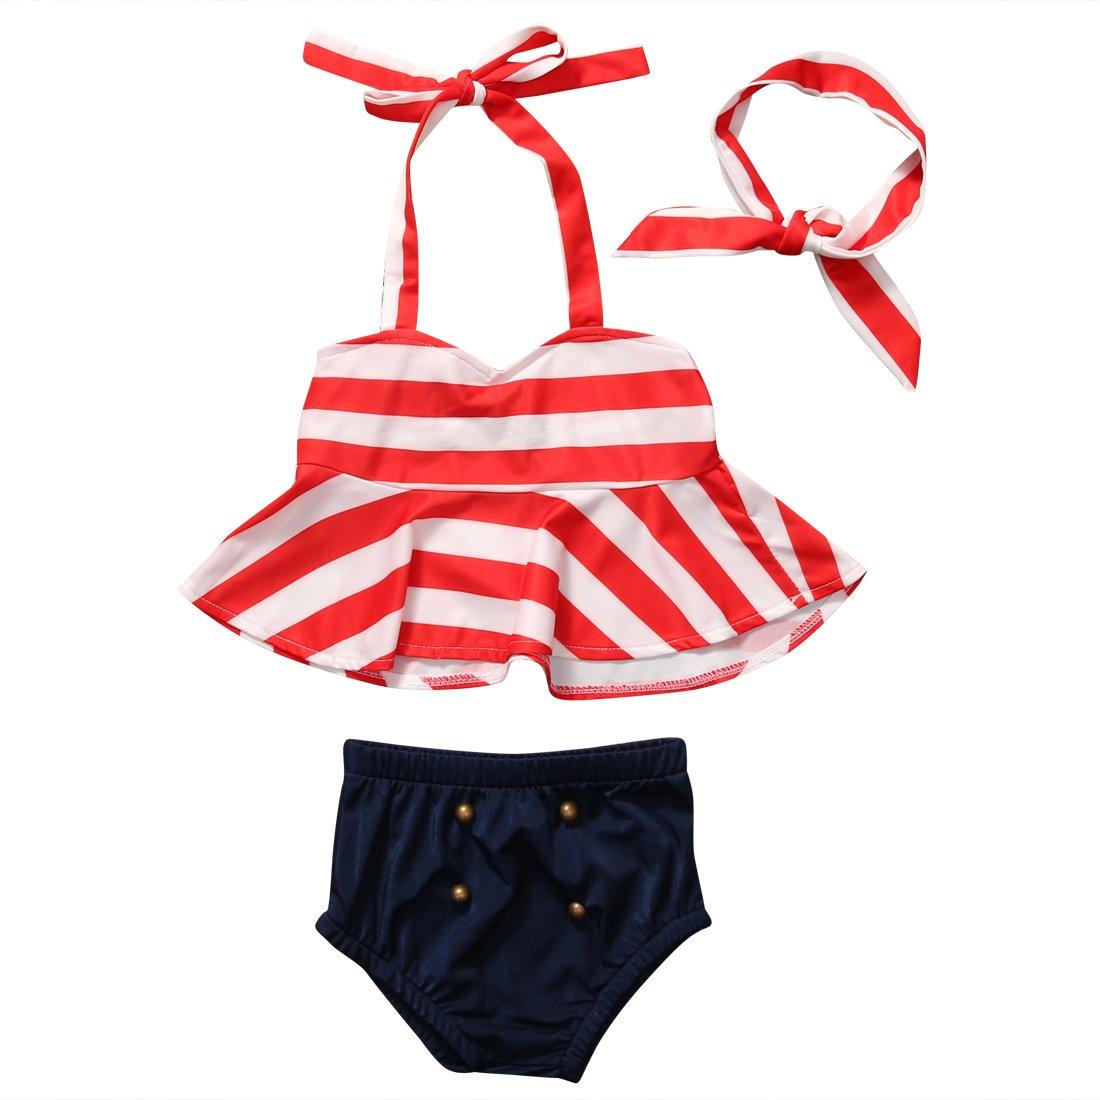 Hirigin Baby Girls 3 Pcs Bikini Sets Striped Halter Bra Top+Bottom+Headband Swimwear FT16053